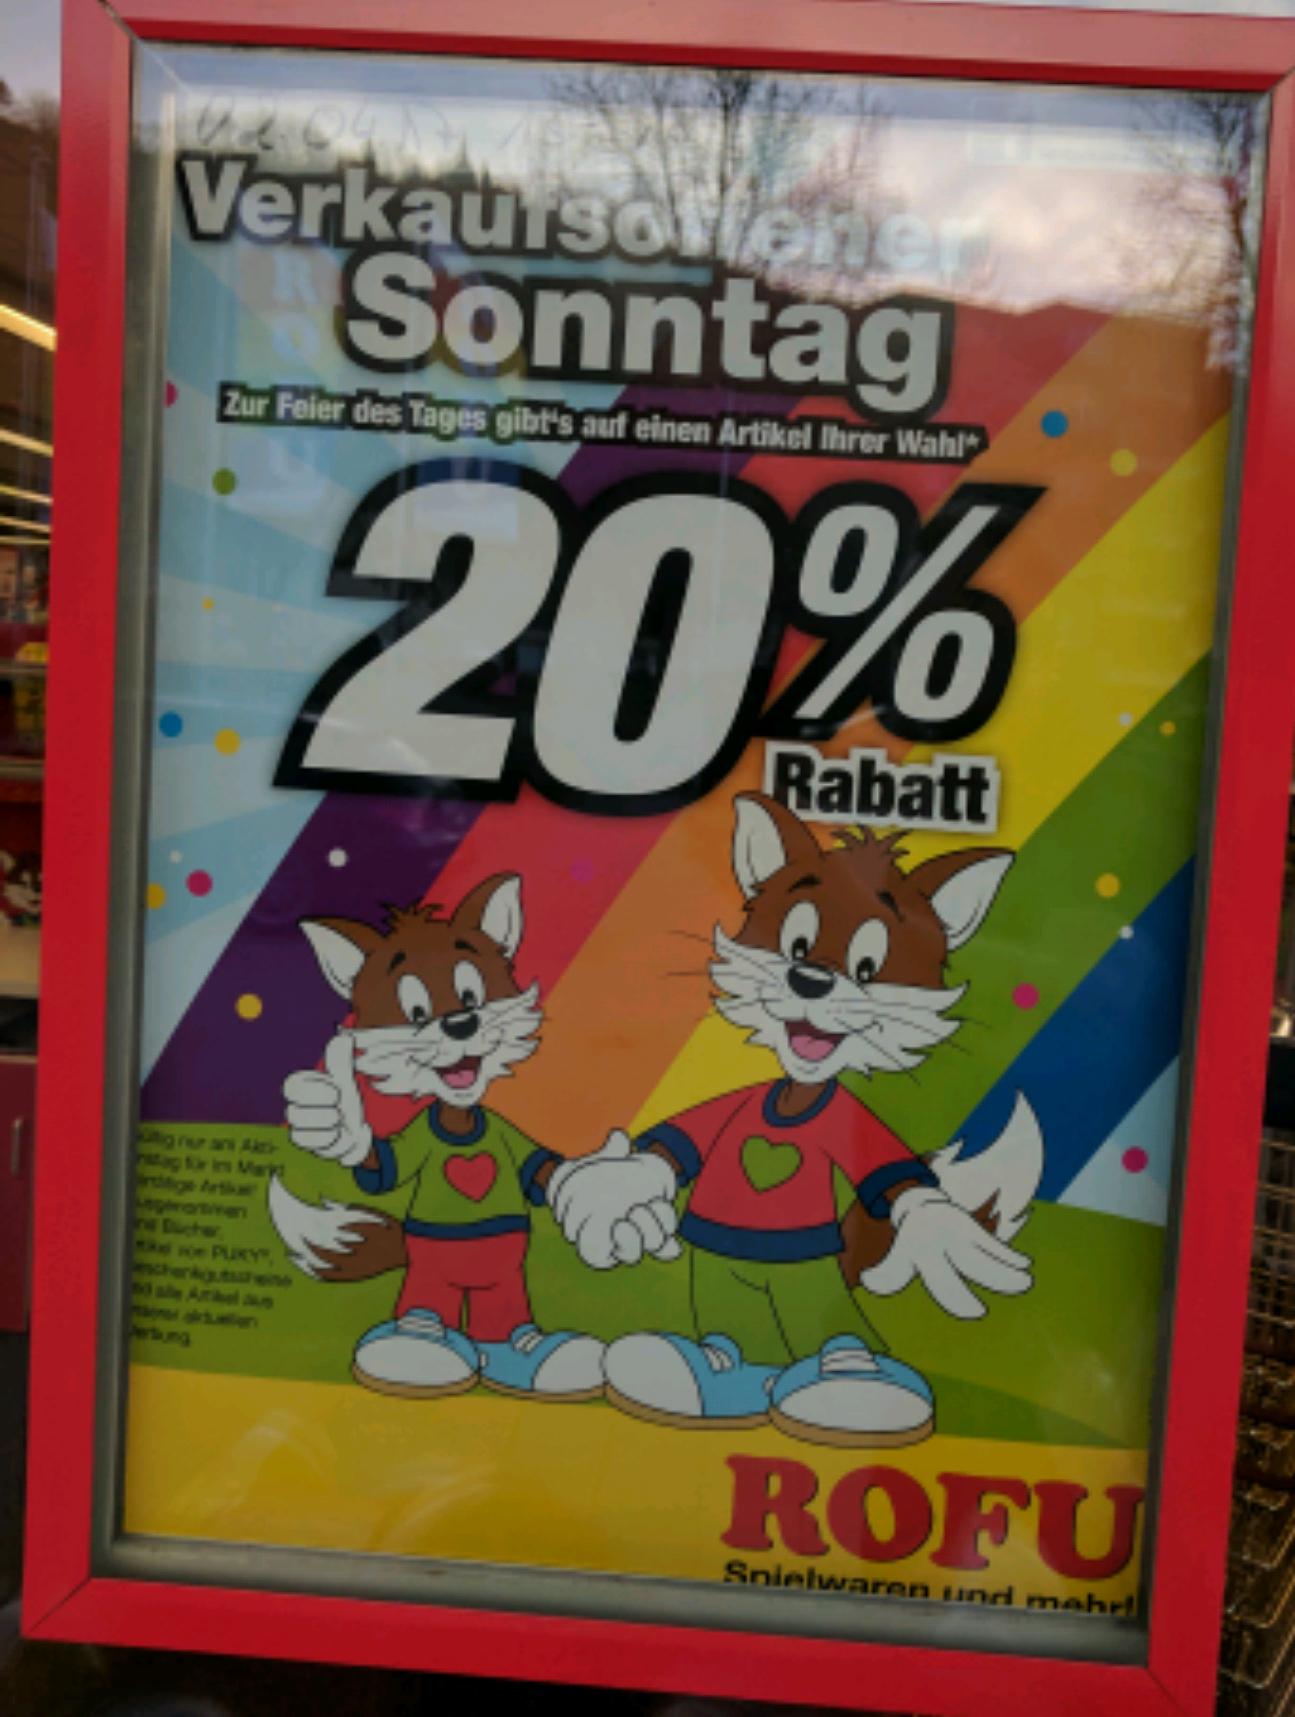 [Lokal Trier] Rofu 20% Rabatt auf 1 Artikel (02.04.)